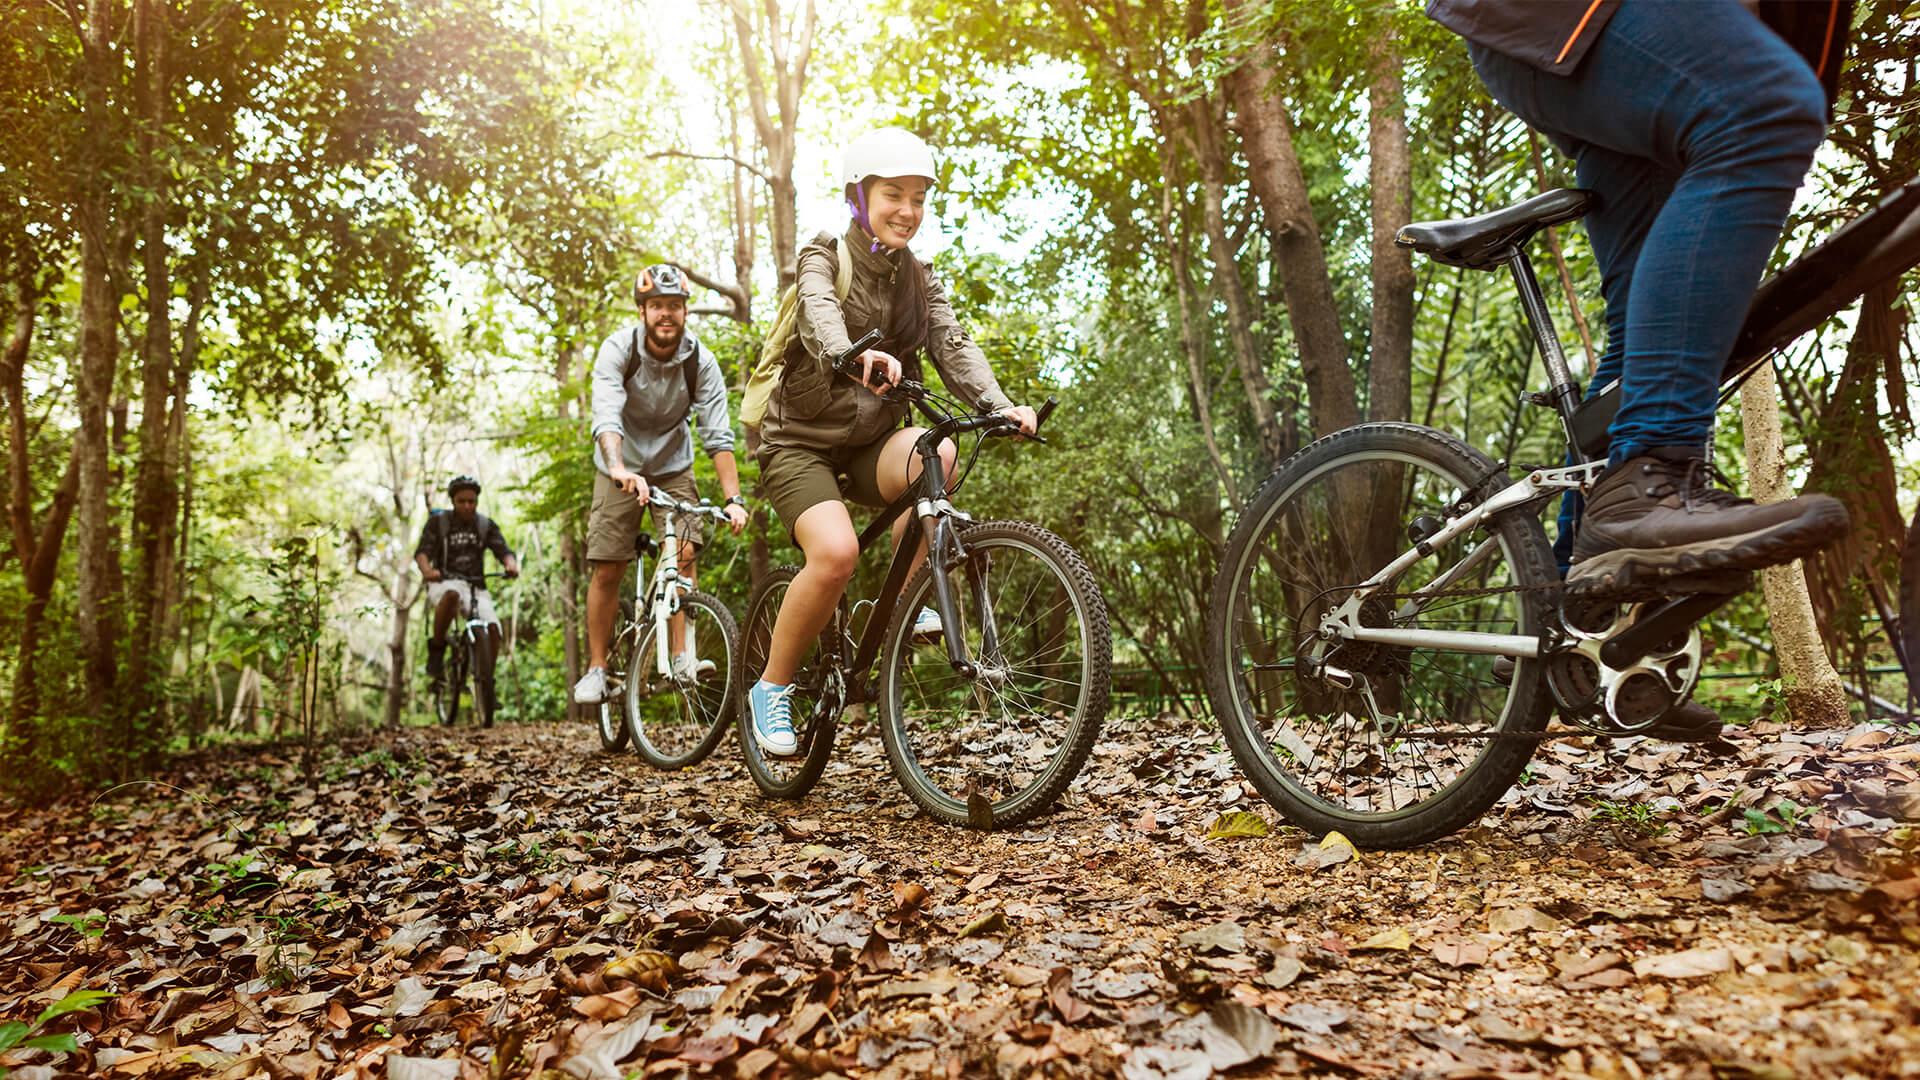 Inchirieri de biciclete Piatra-Neamt